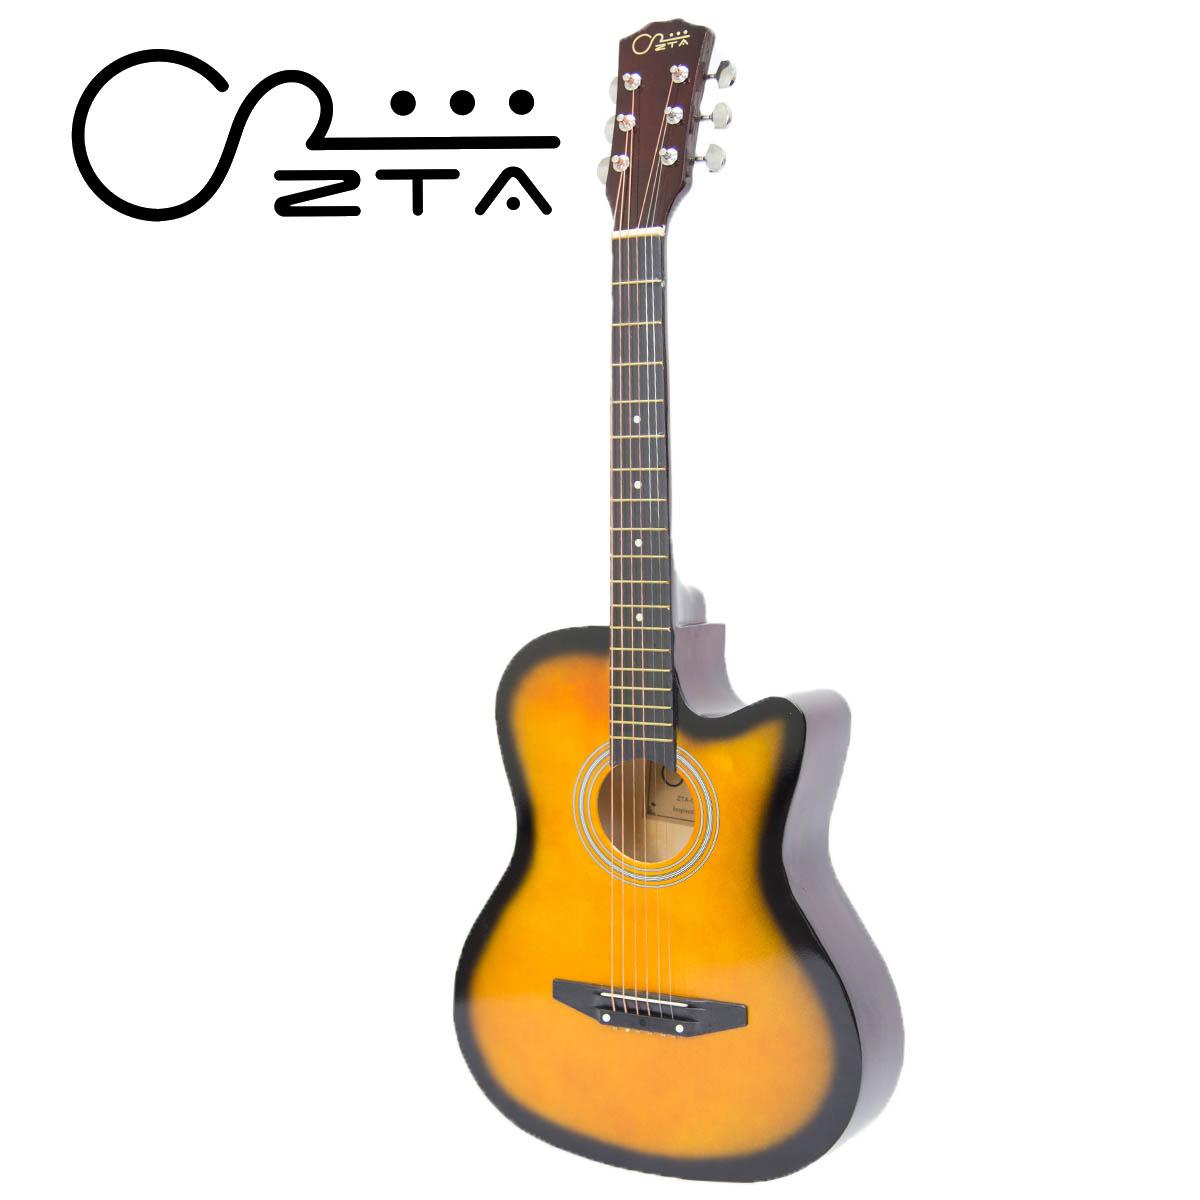 Zta 38 Inch Acoustic Guitar Sunburs End 6 14 2021 1200 Am Pickup On An Electric Bass Or Sunburst Eq Cutaway Starter Pack Fo